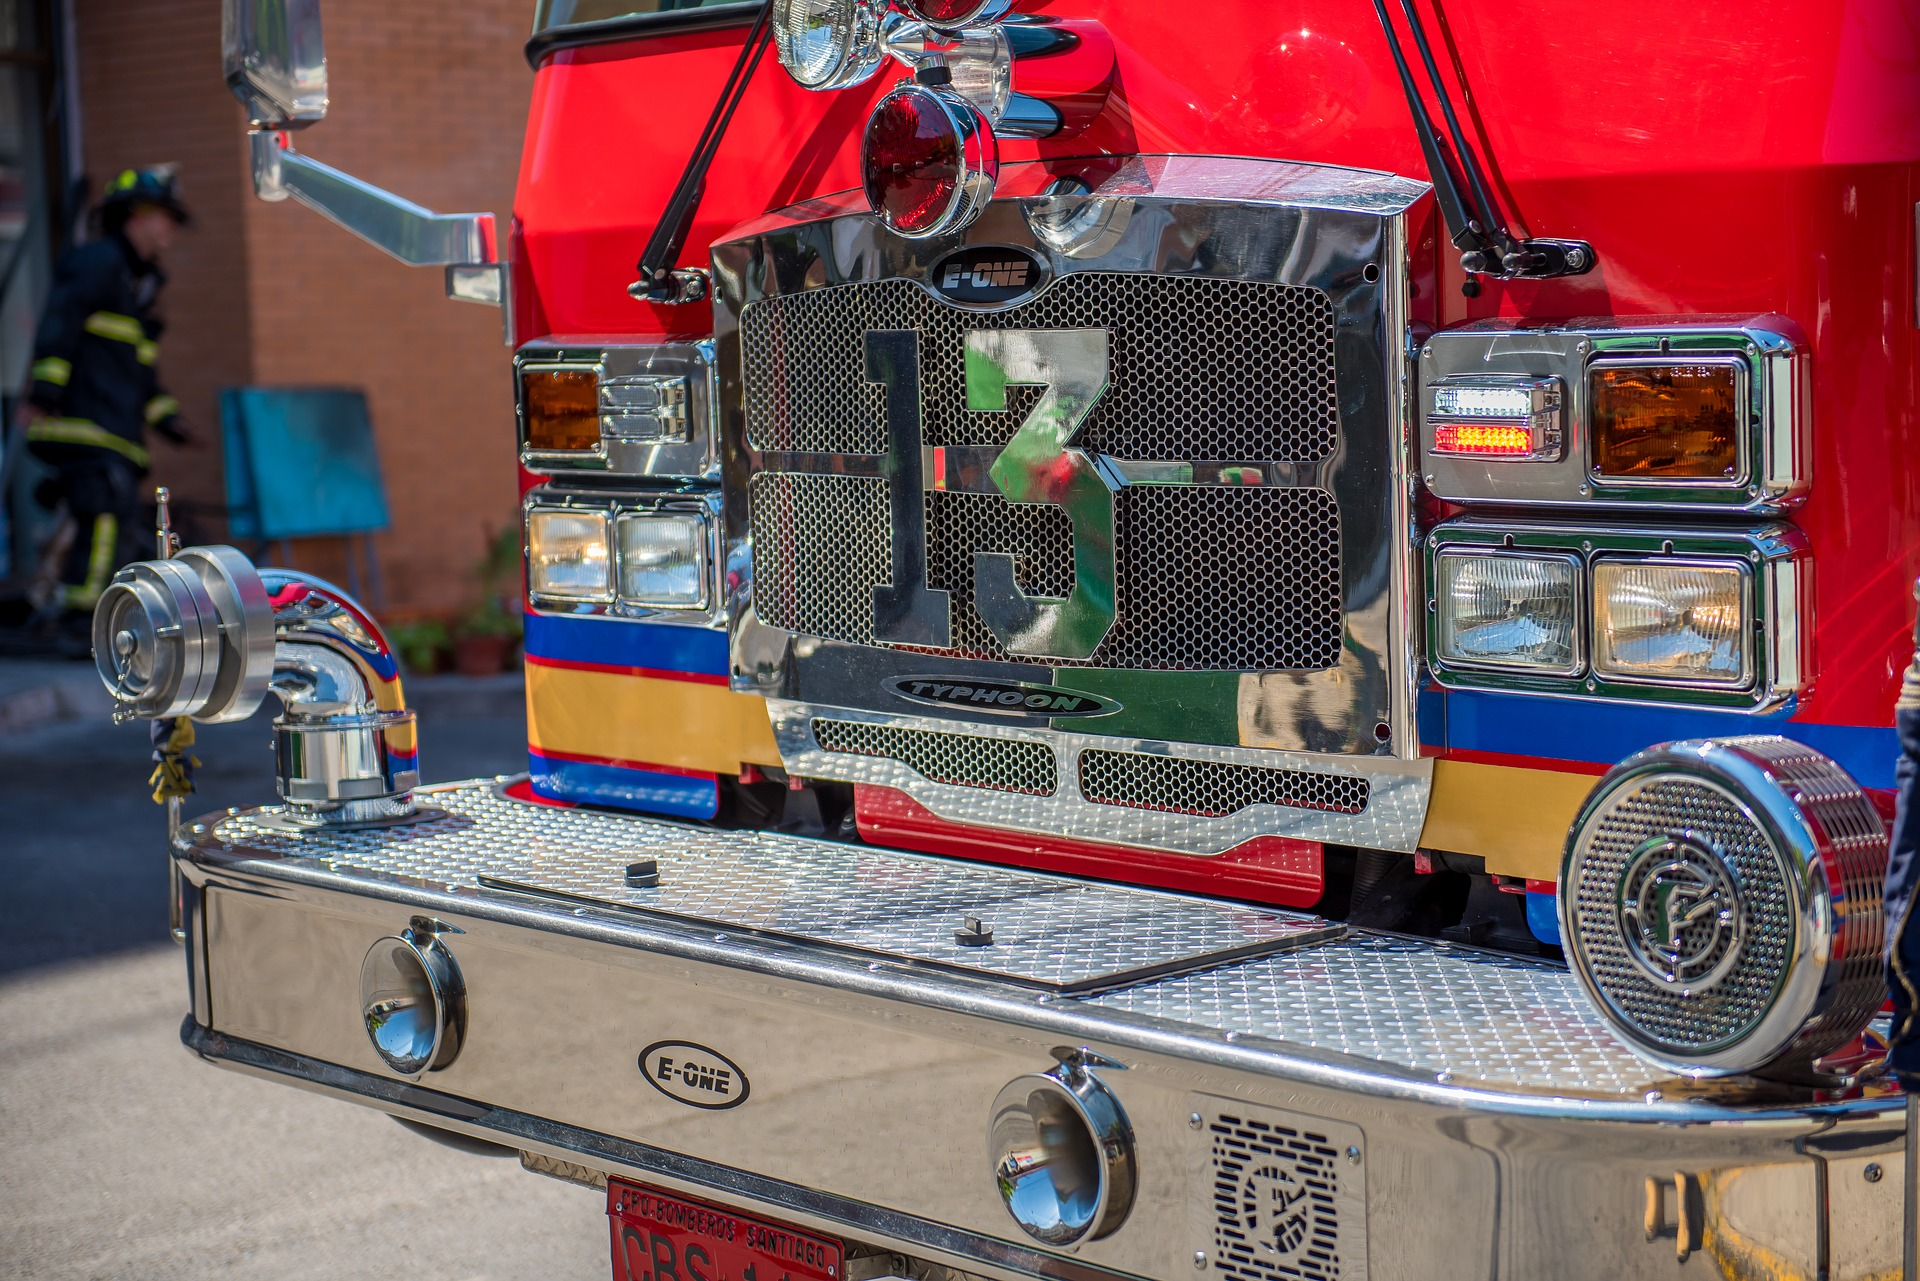 Fire Engine front.jpg